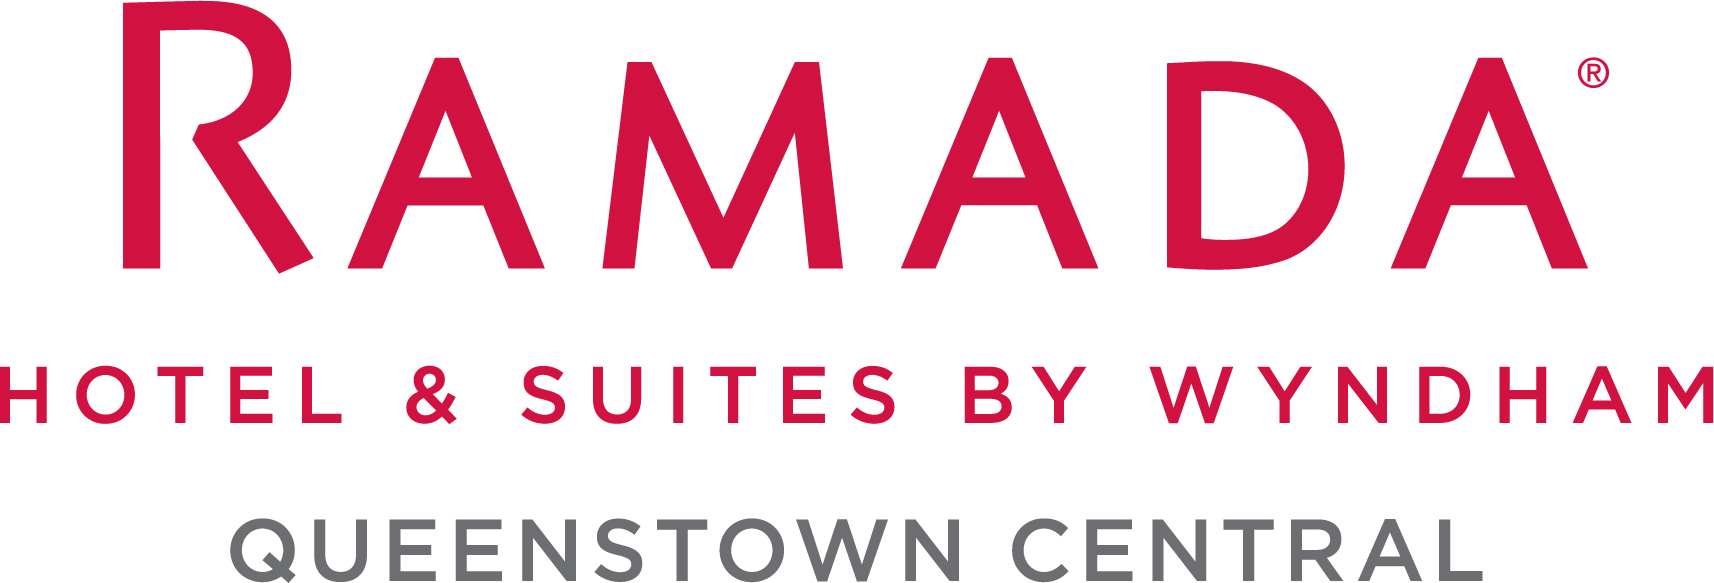 Ramada logo Queenstown